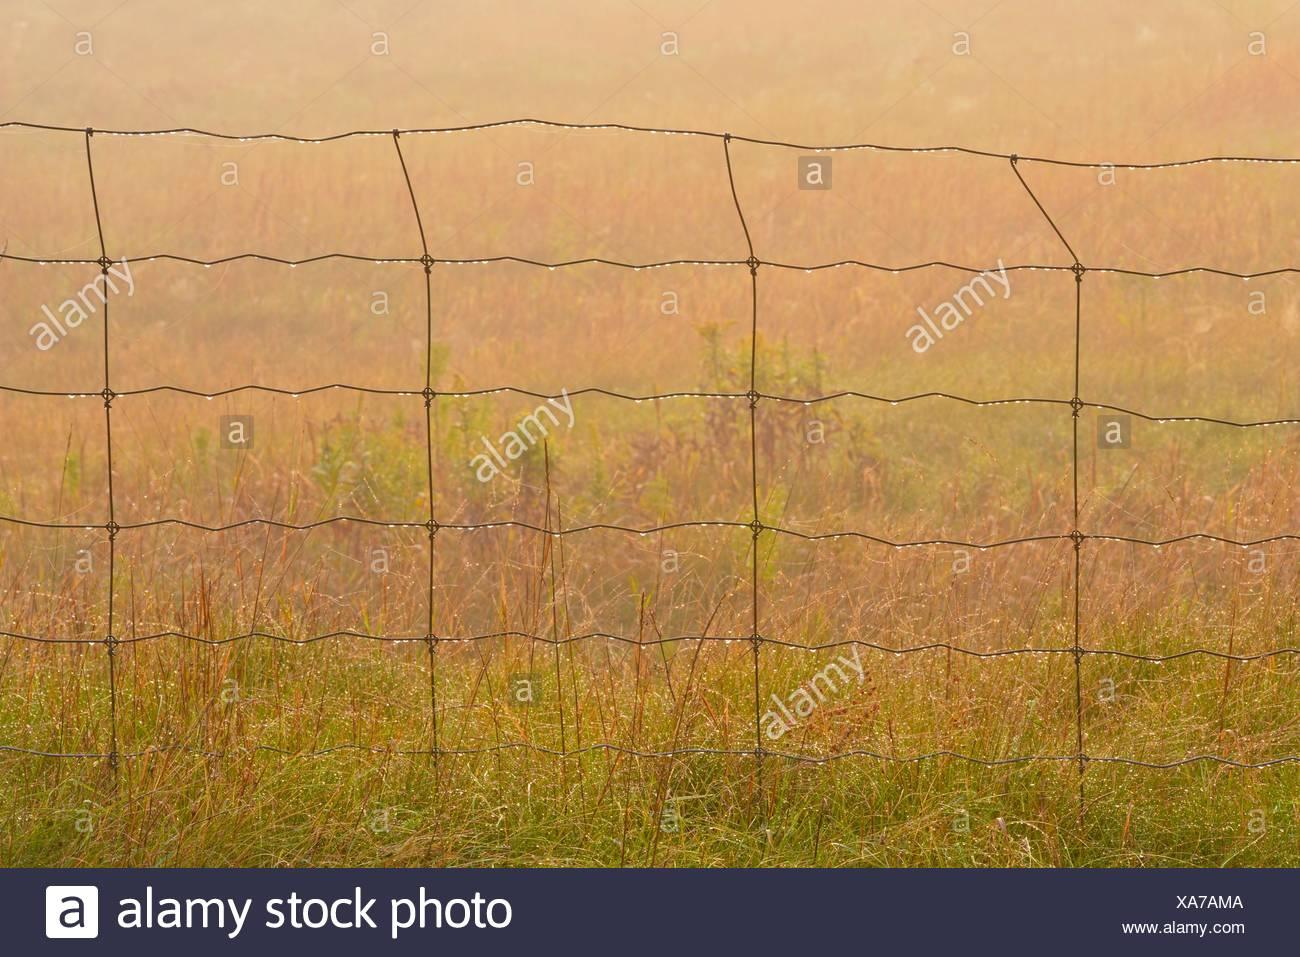 Zaun Und Tau Fallt Grossere Sudbury Walden Ontario Kanada